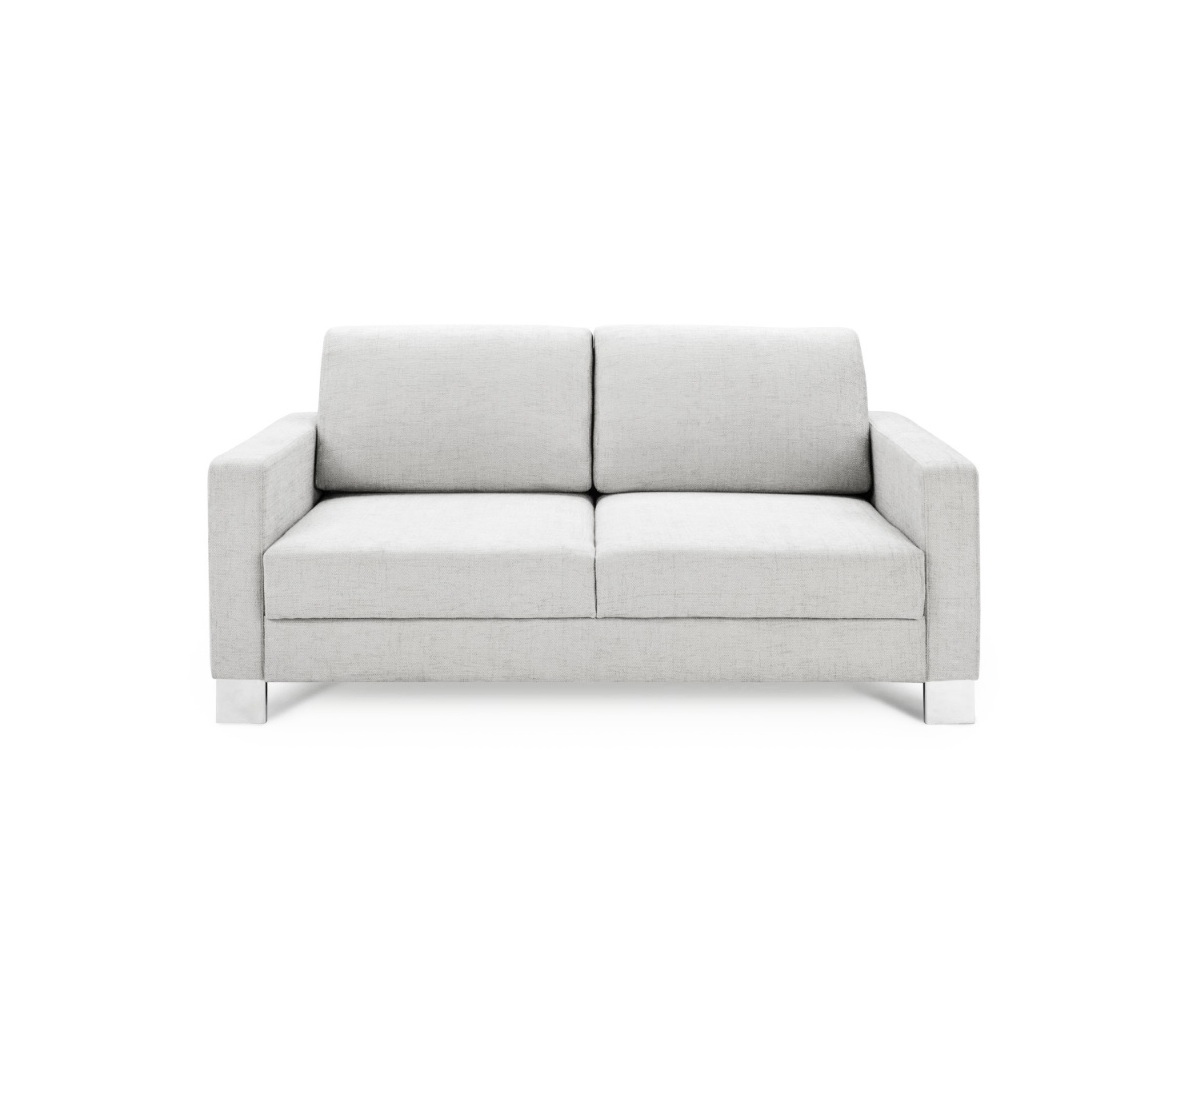 Lantana 2 Seater Sofa-0